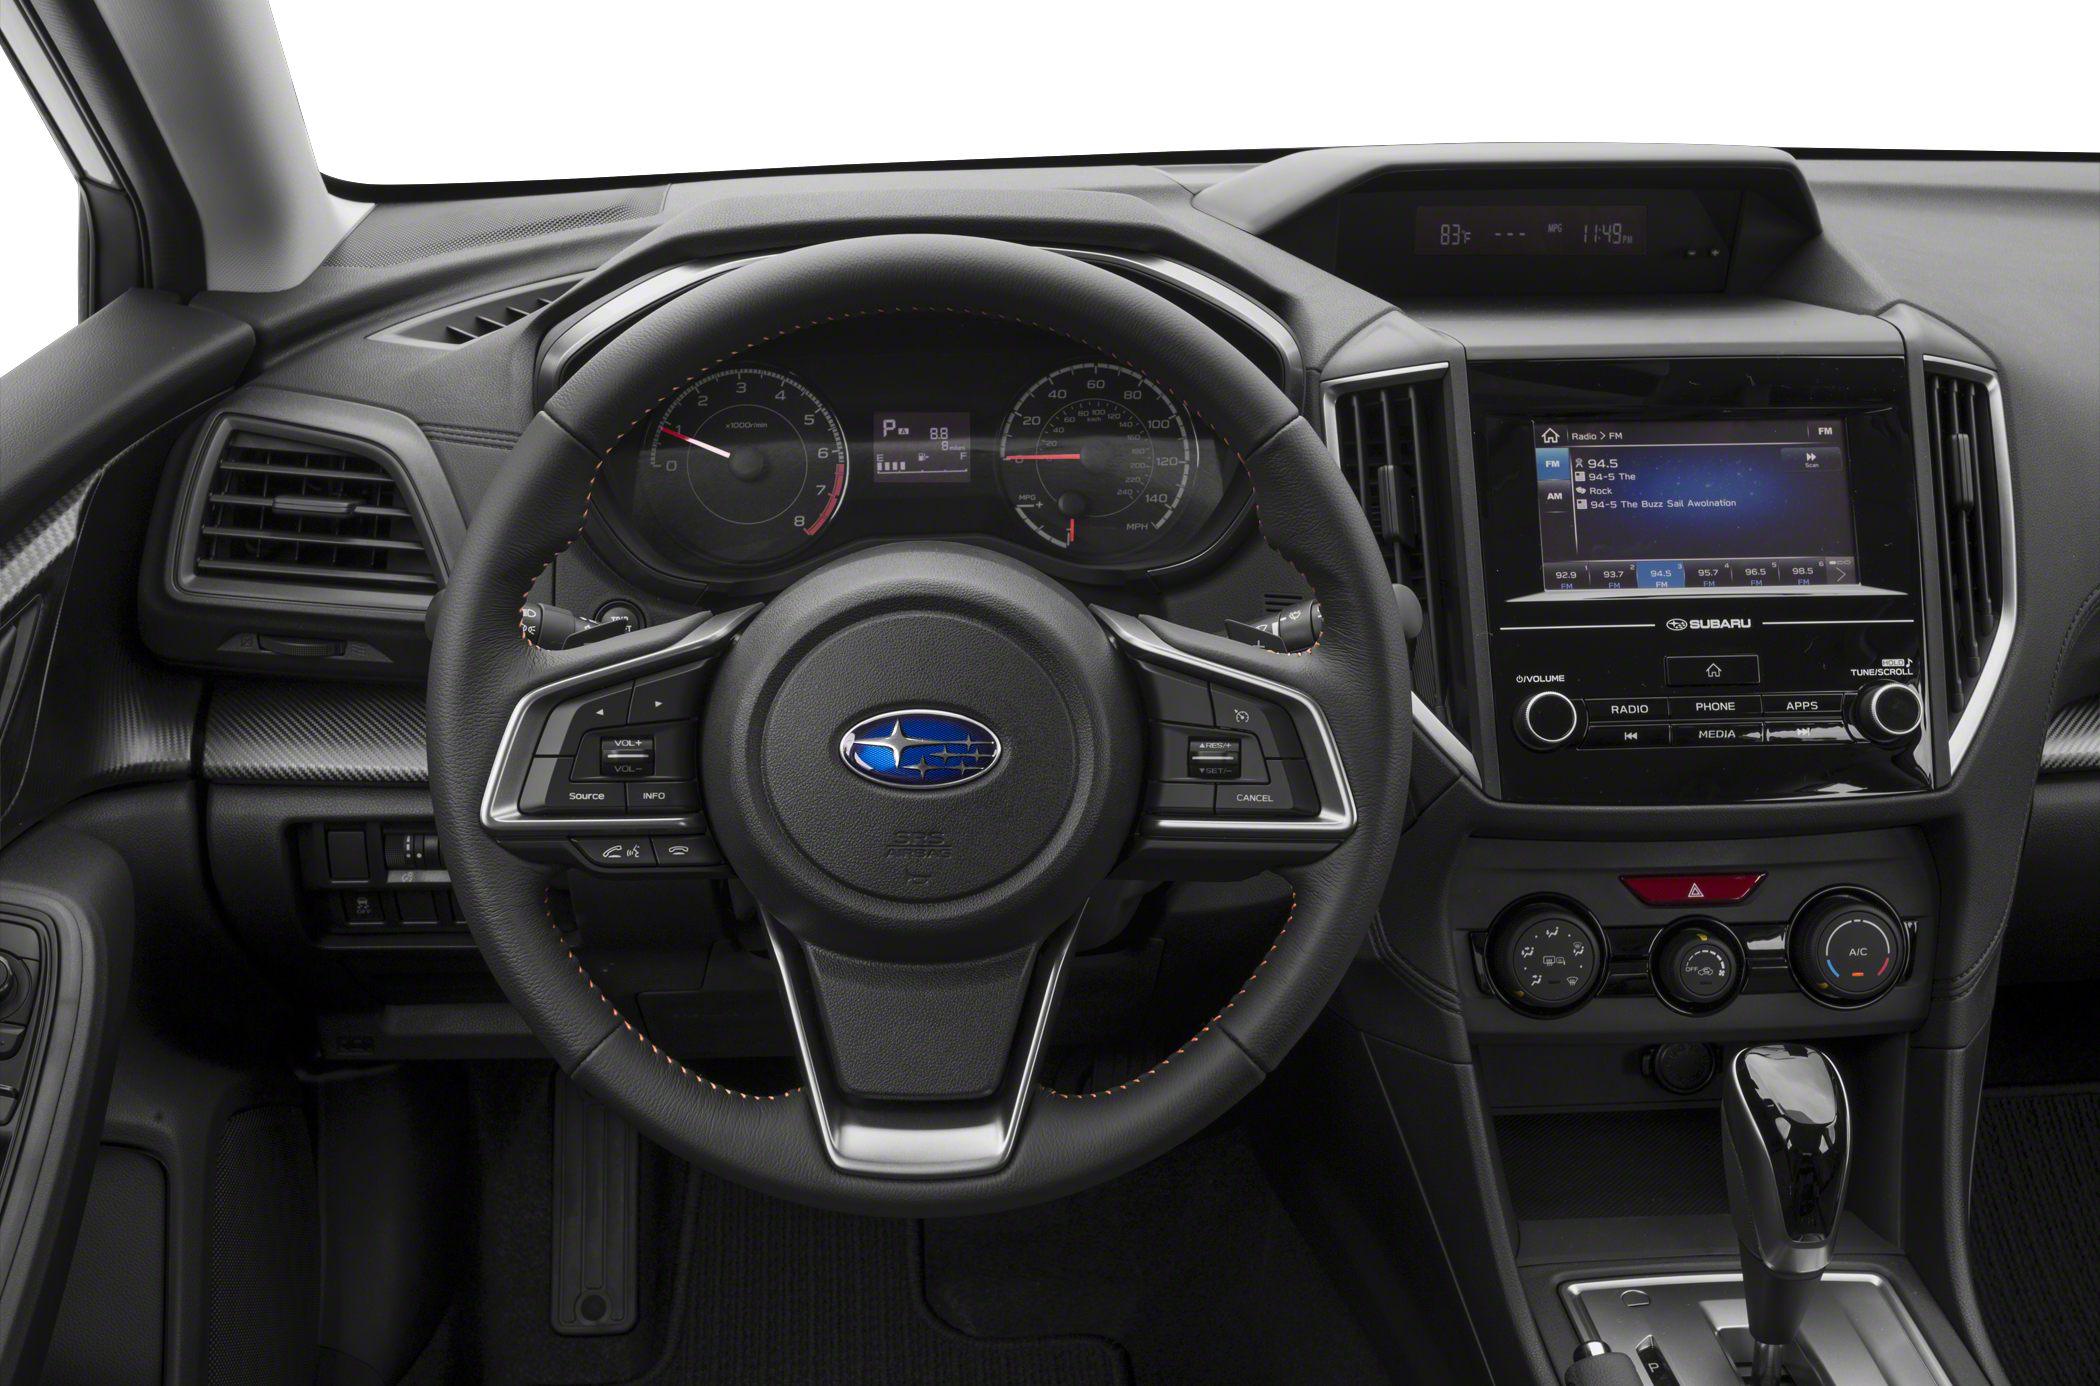 2018 Subaru Crosstrek Deals, Prices, Incentives & Leases ...